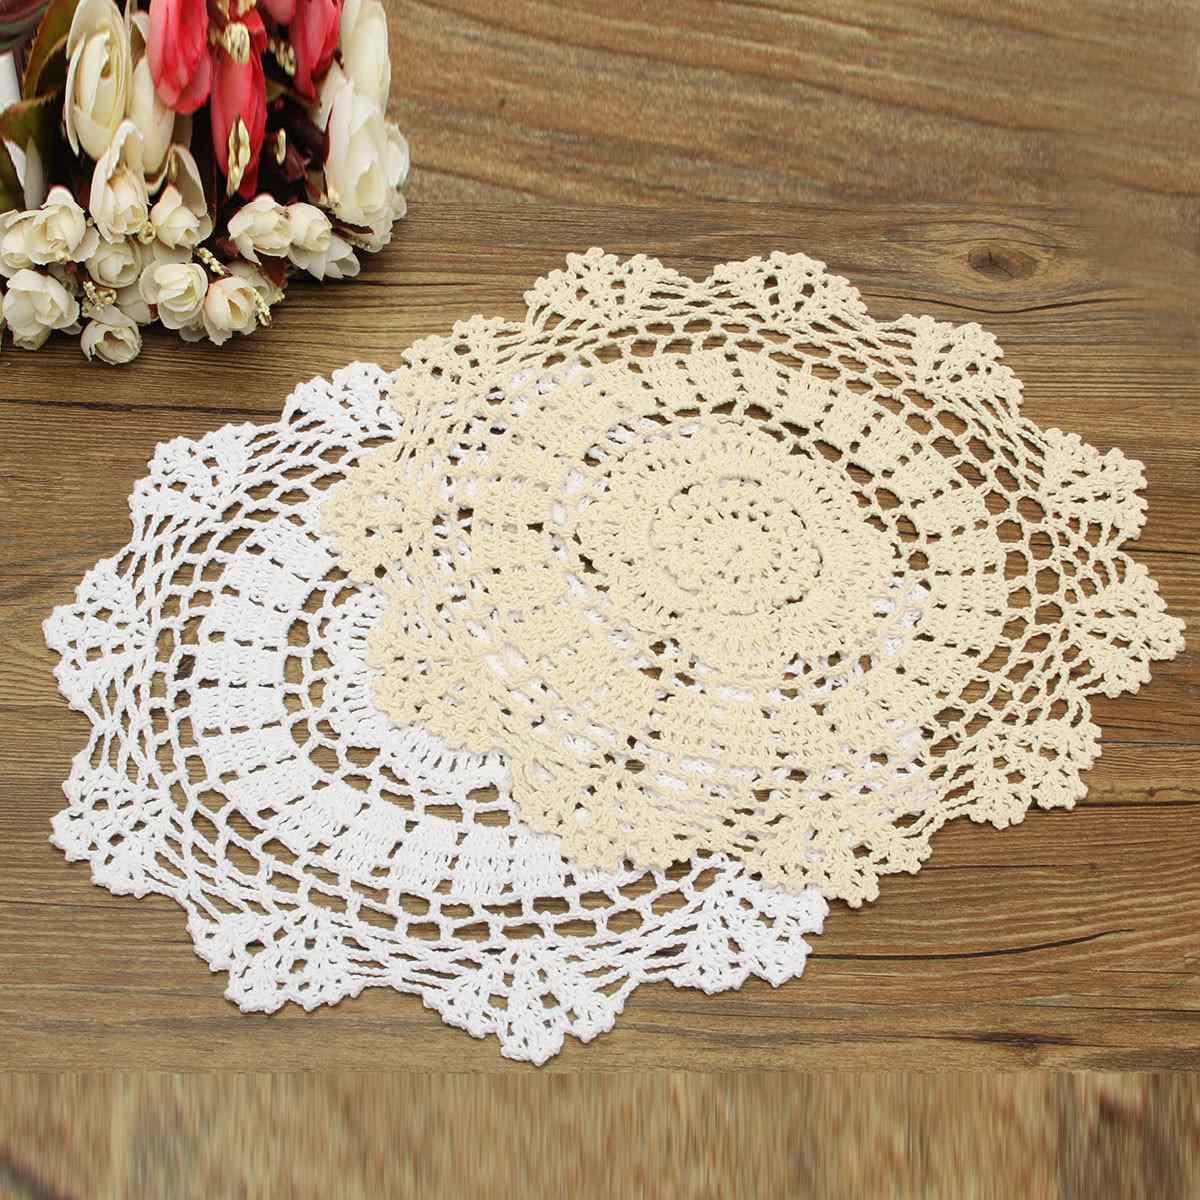 2 Colors 30cm Pastoral Round Hand Crocheted Cotton Doilies Flower Shape Placemat Coasters Table Decorative Gadgets Houseware(China (Mainland))